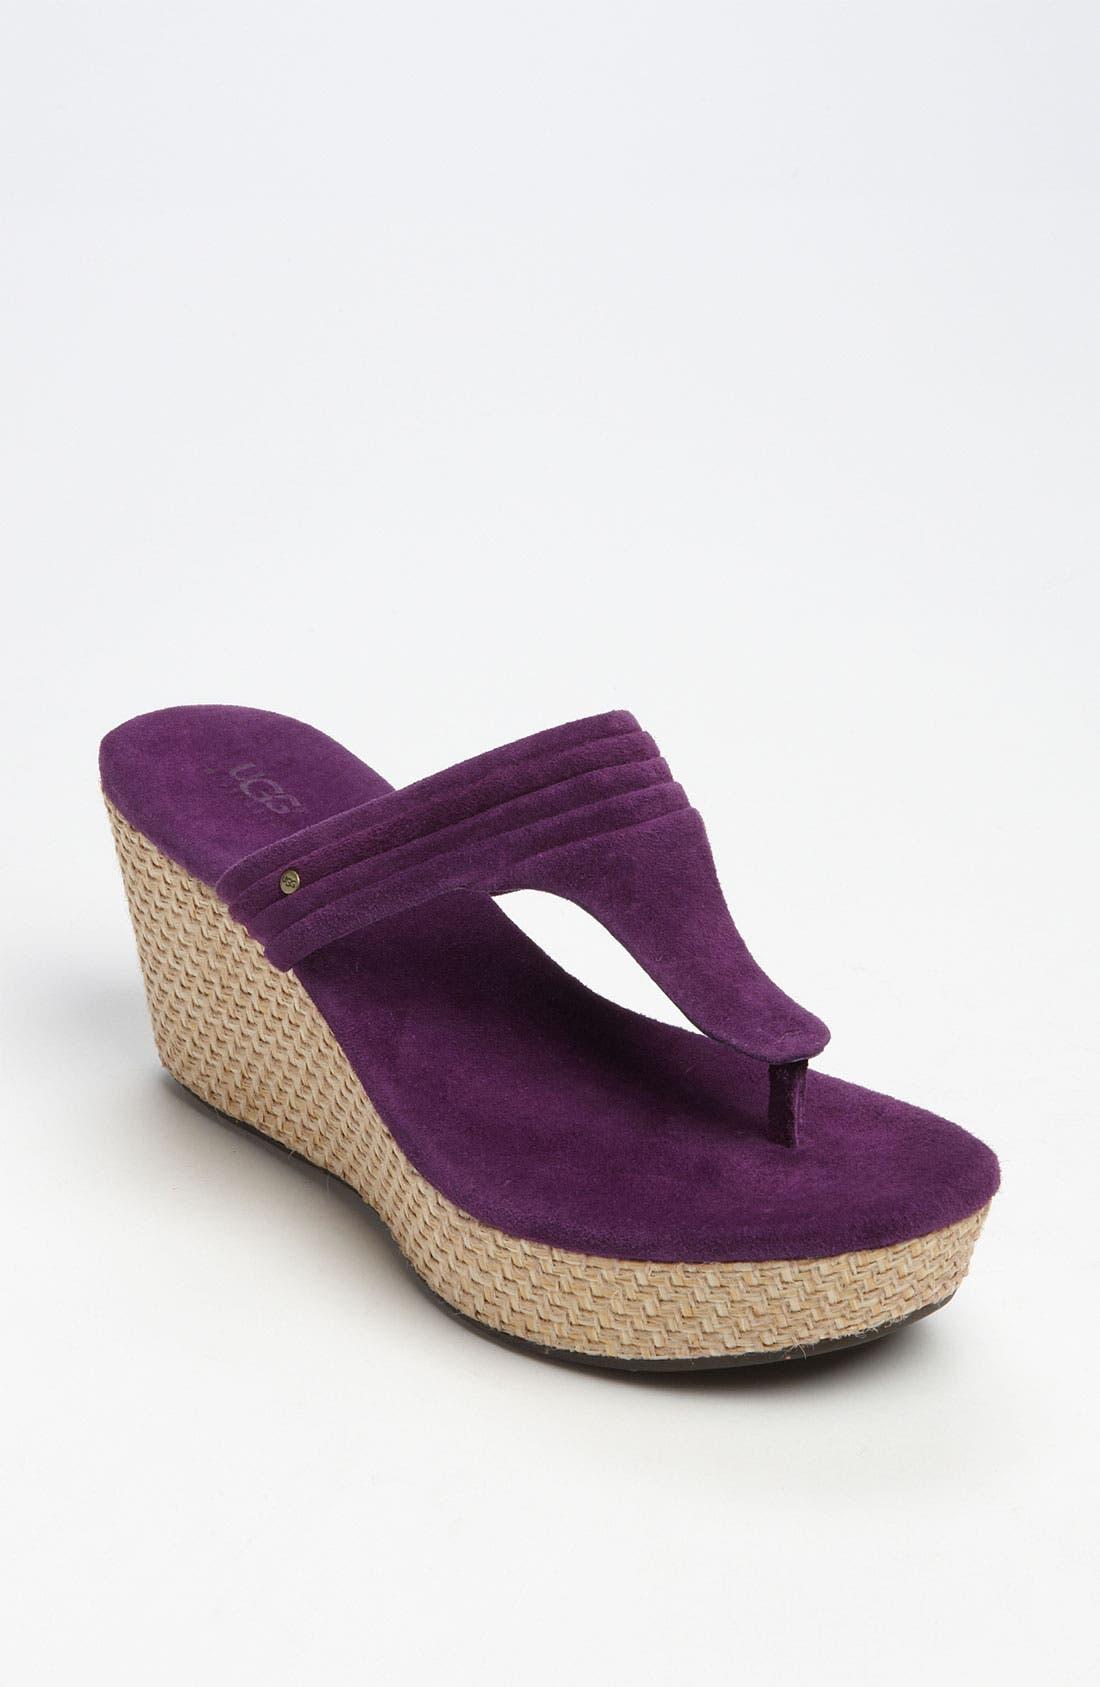 Main Image - UGG® Australia 'Zamora' Wedge Sandal